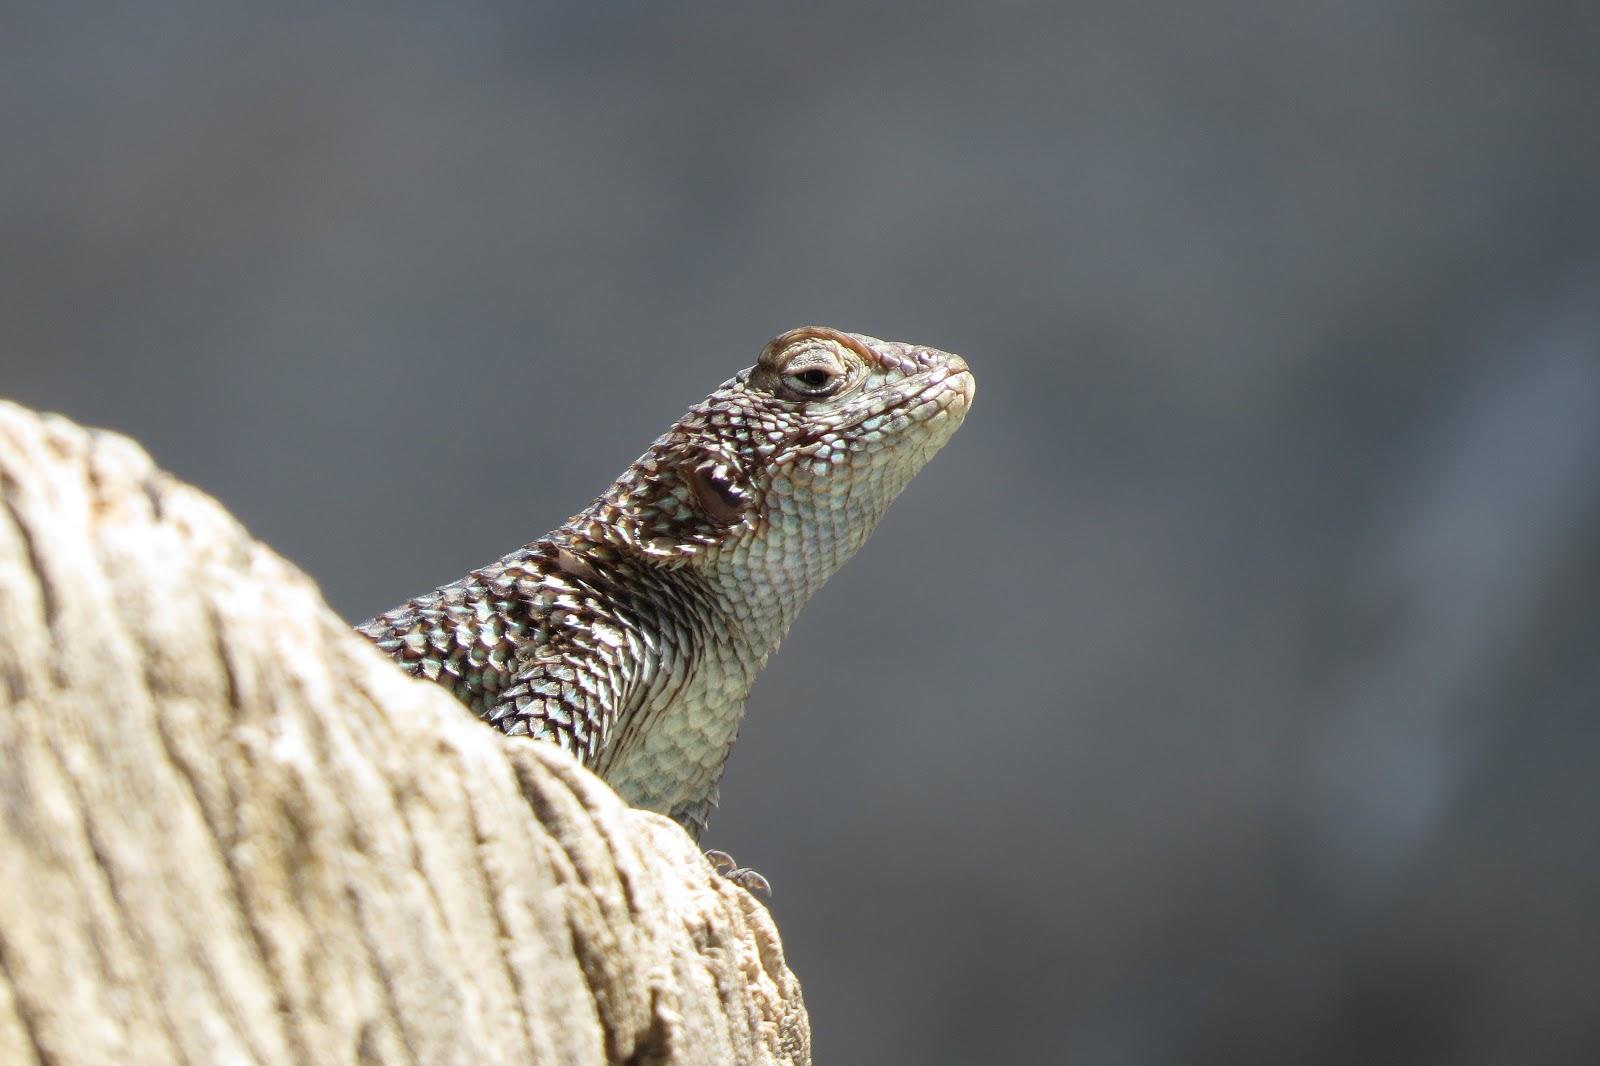 Indian Canyon spiny lizard